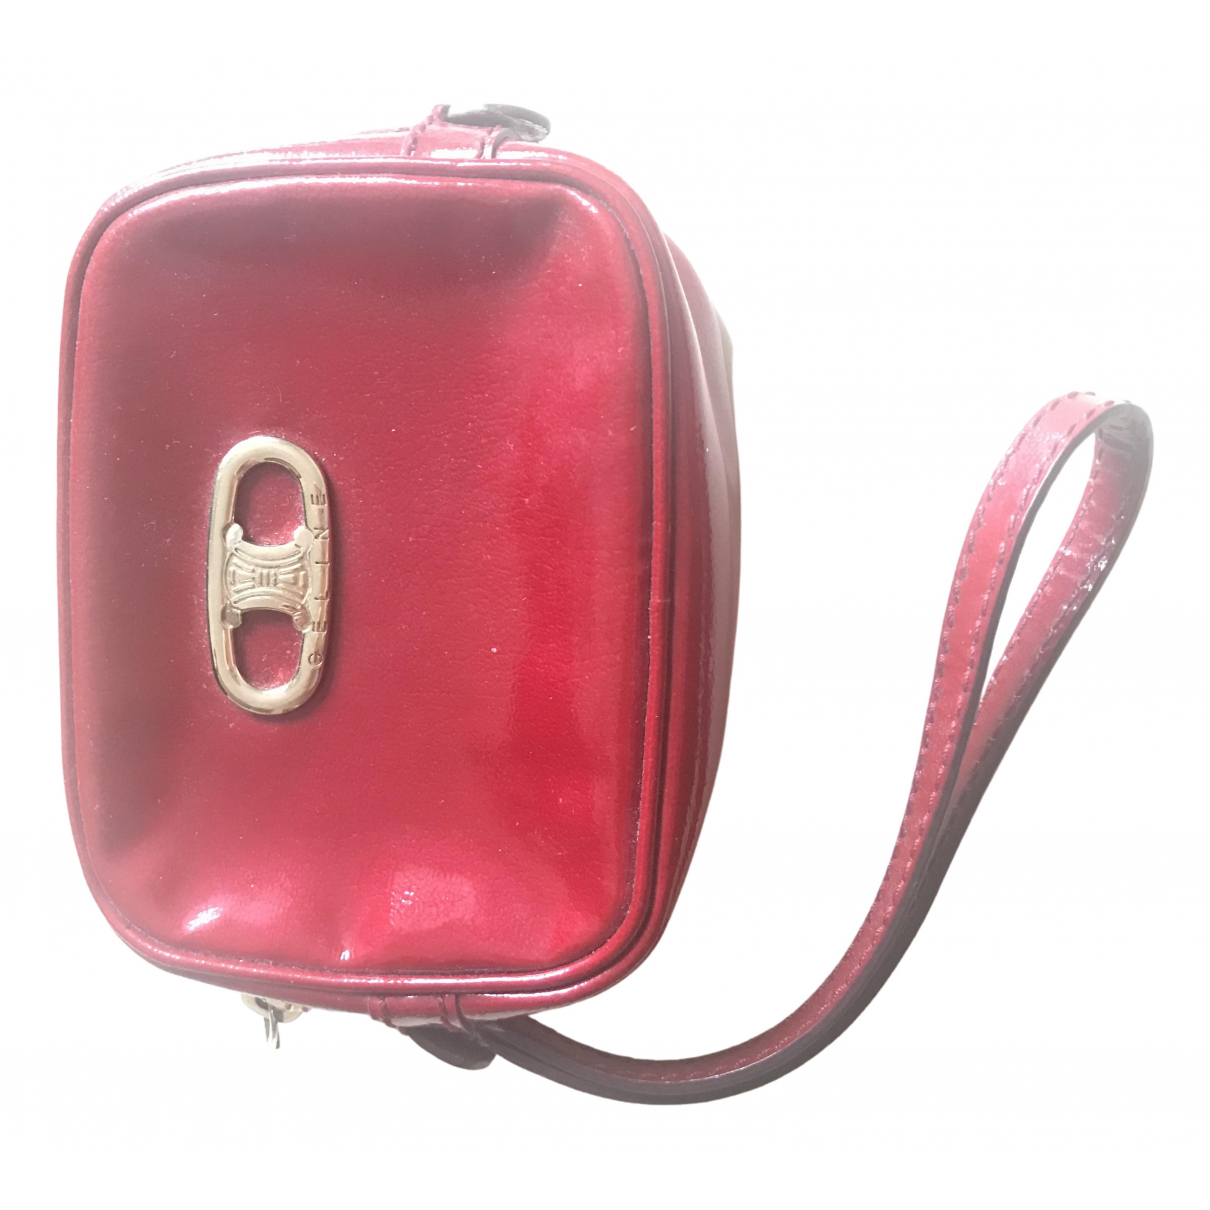 Celine \N Clutch in  Rot Leder